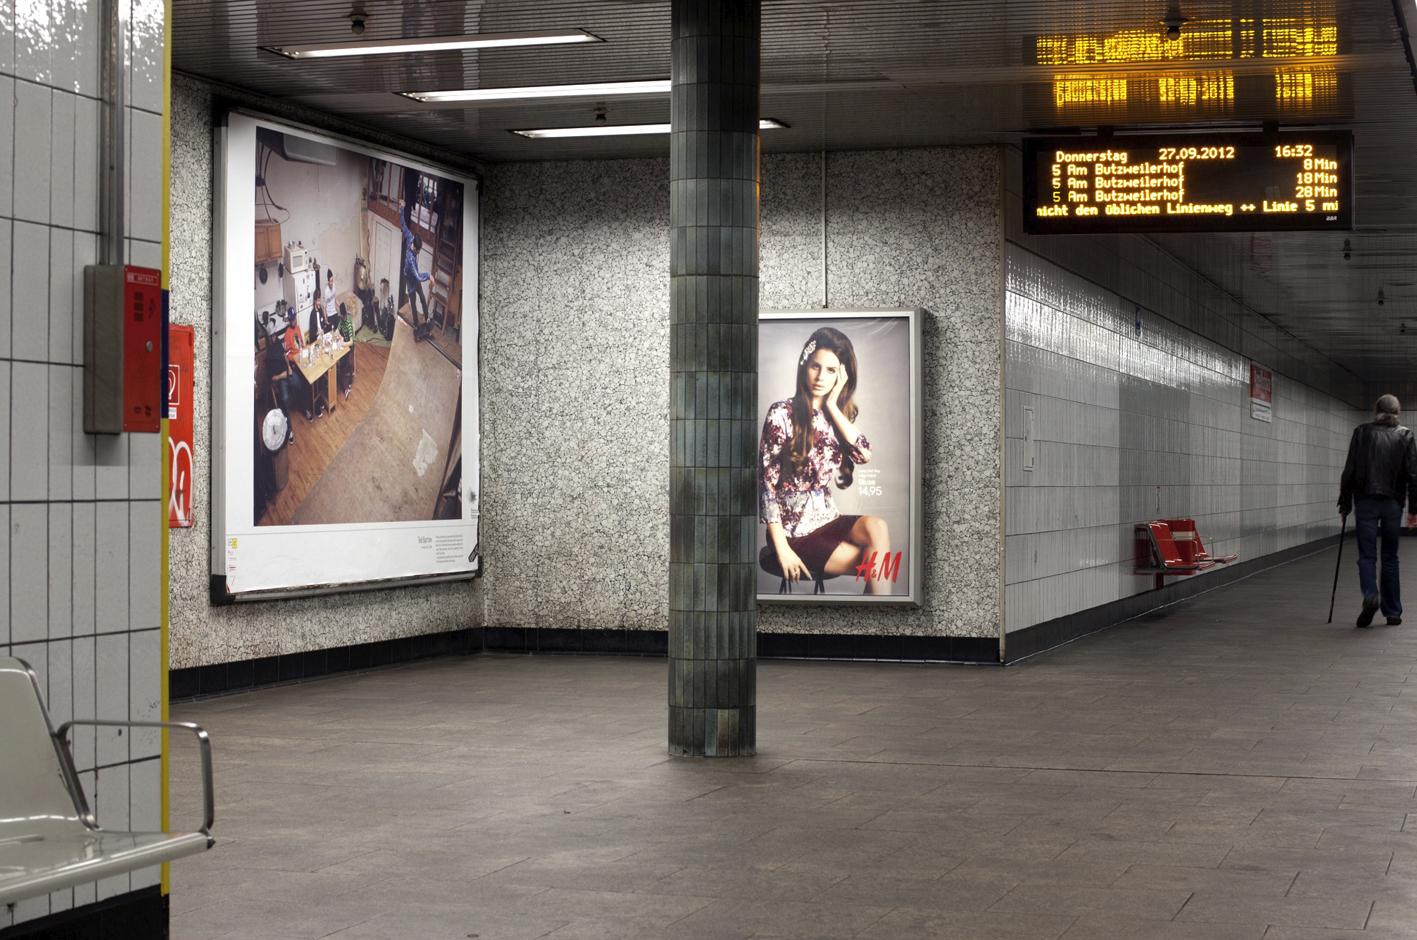 NYCC Appelhofplatz curated by Alexander Basile